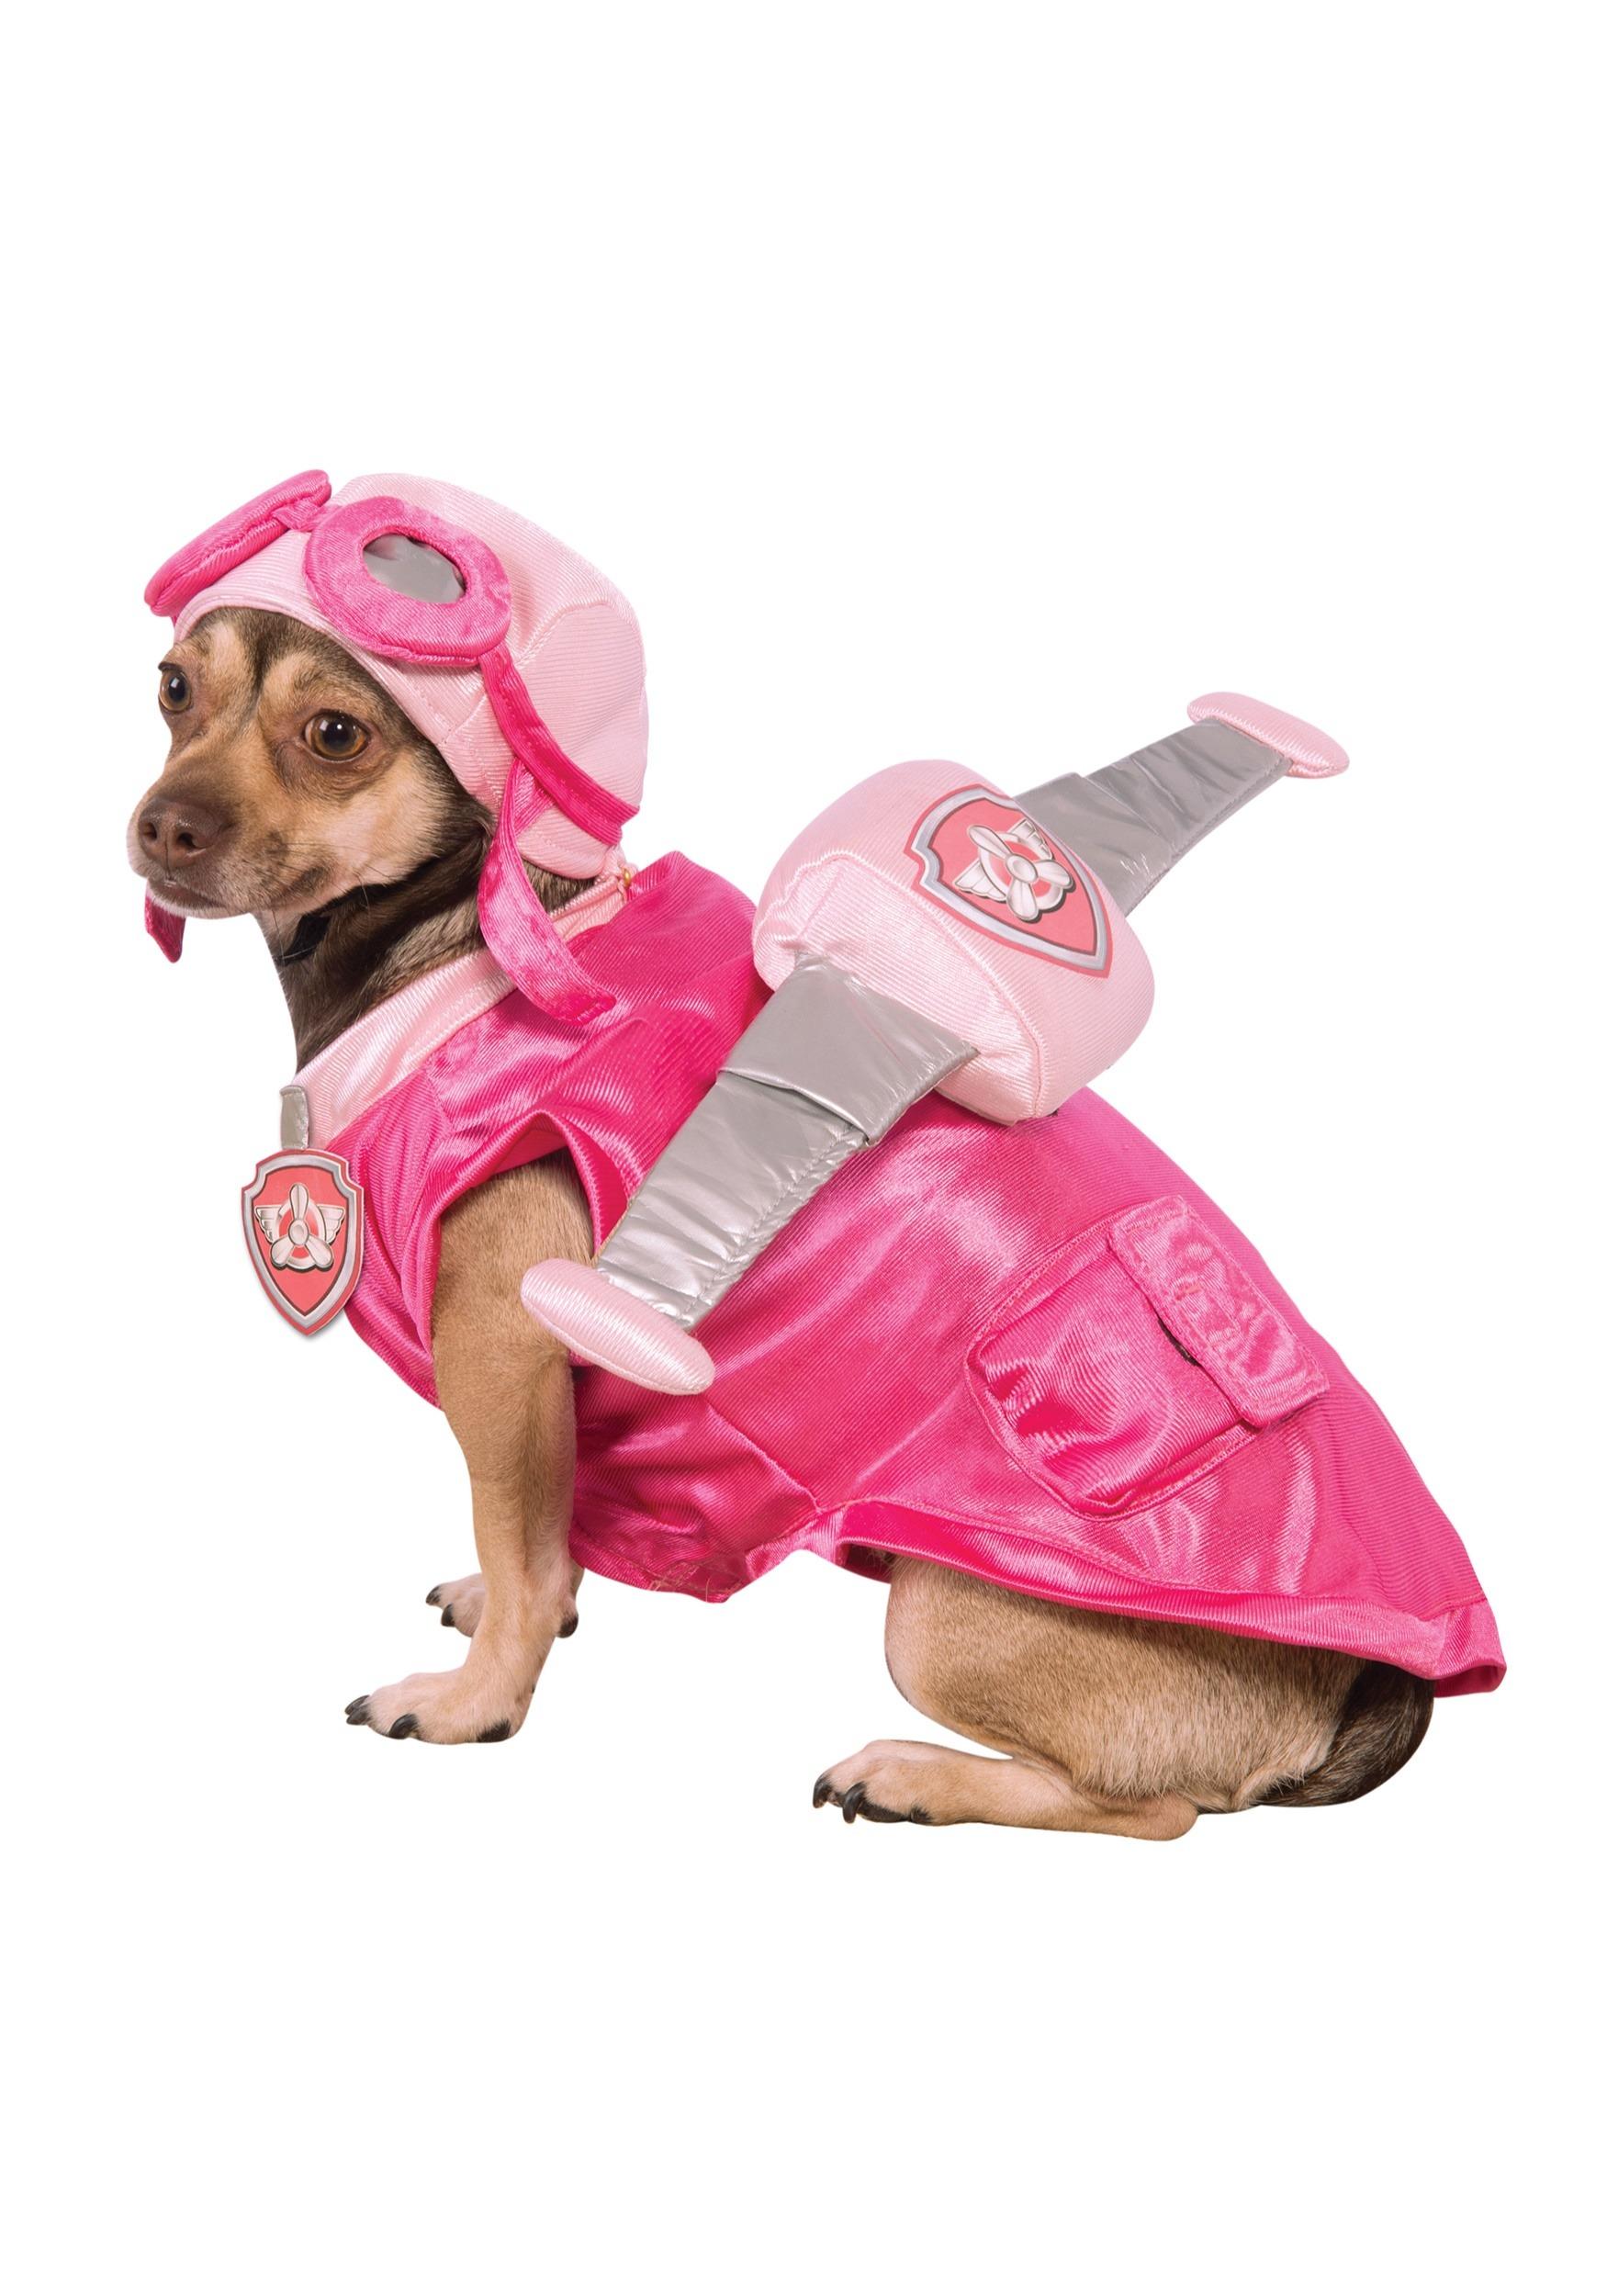 b24caba7d0ce2 Paw Patrol Skye Pet Costume